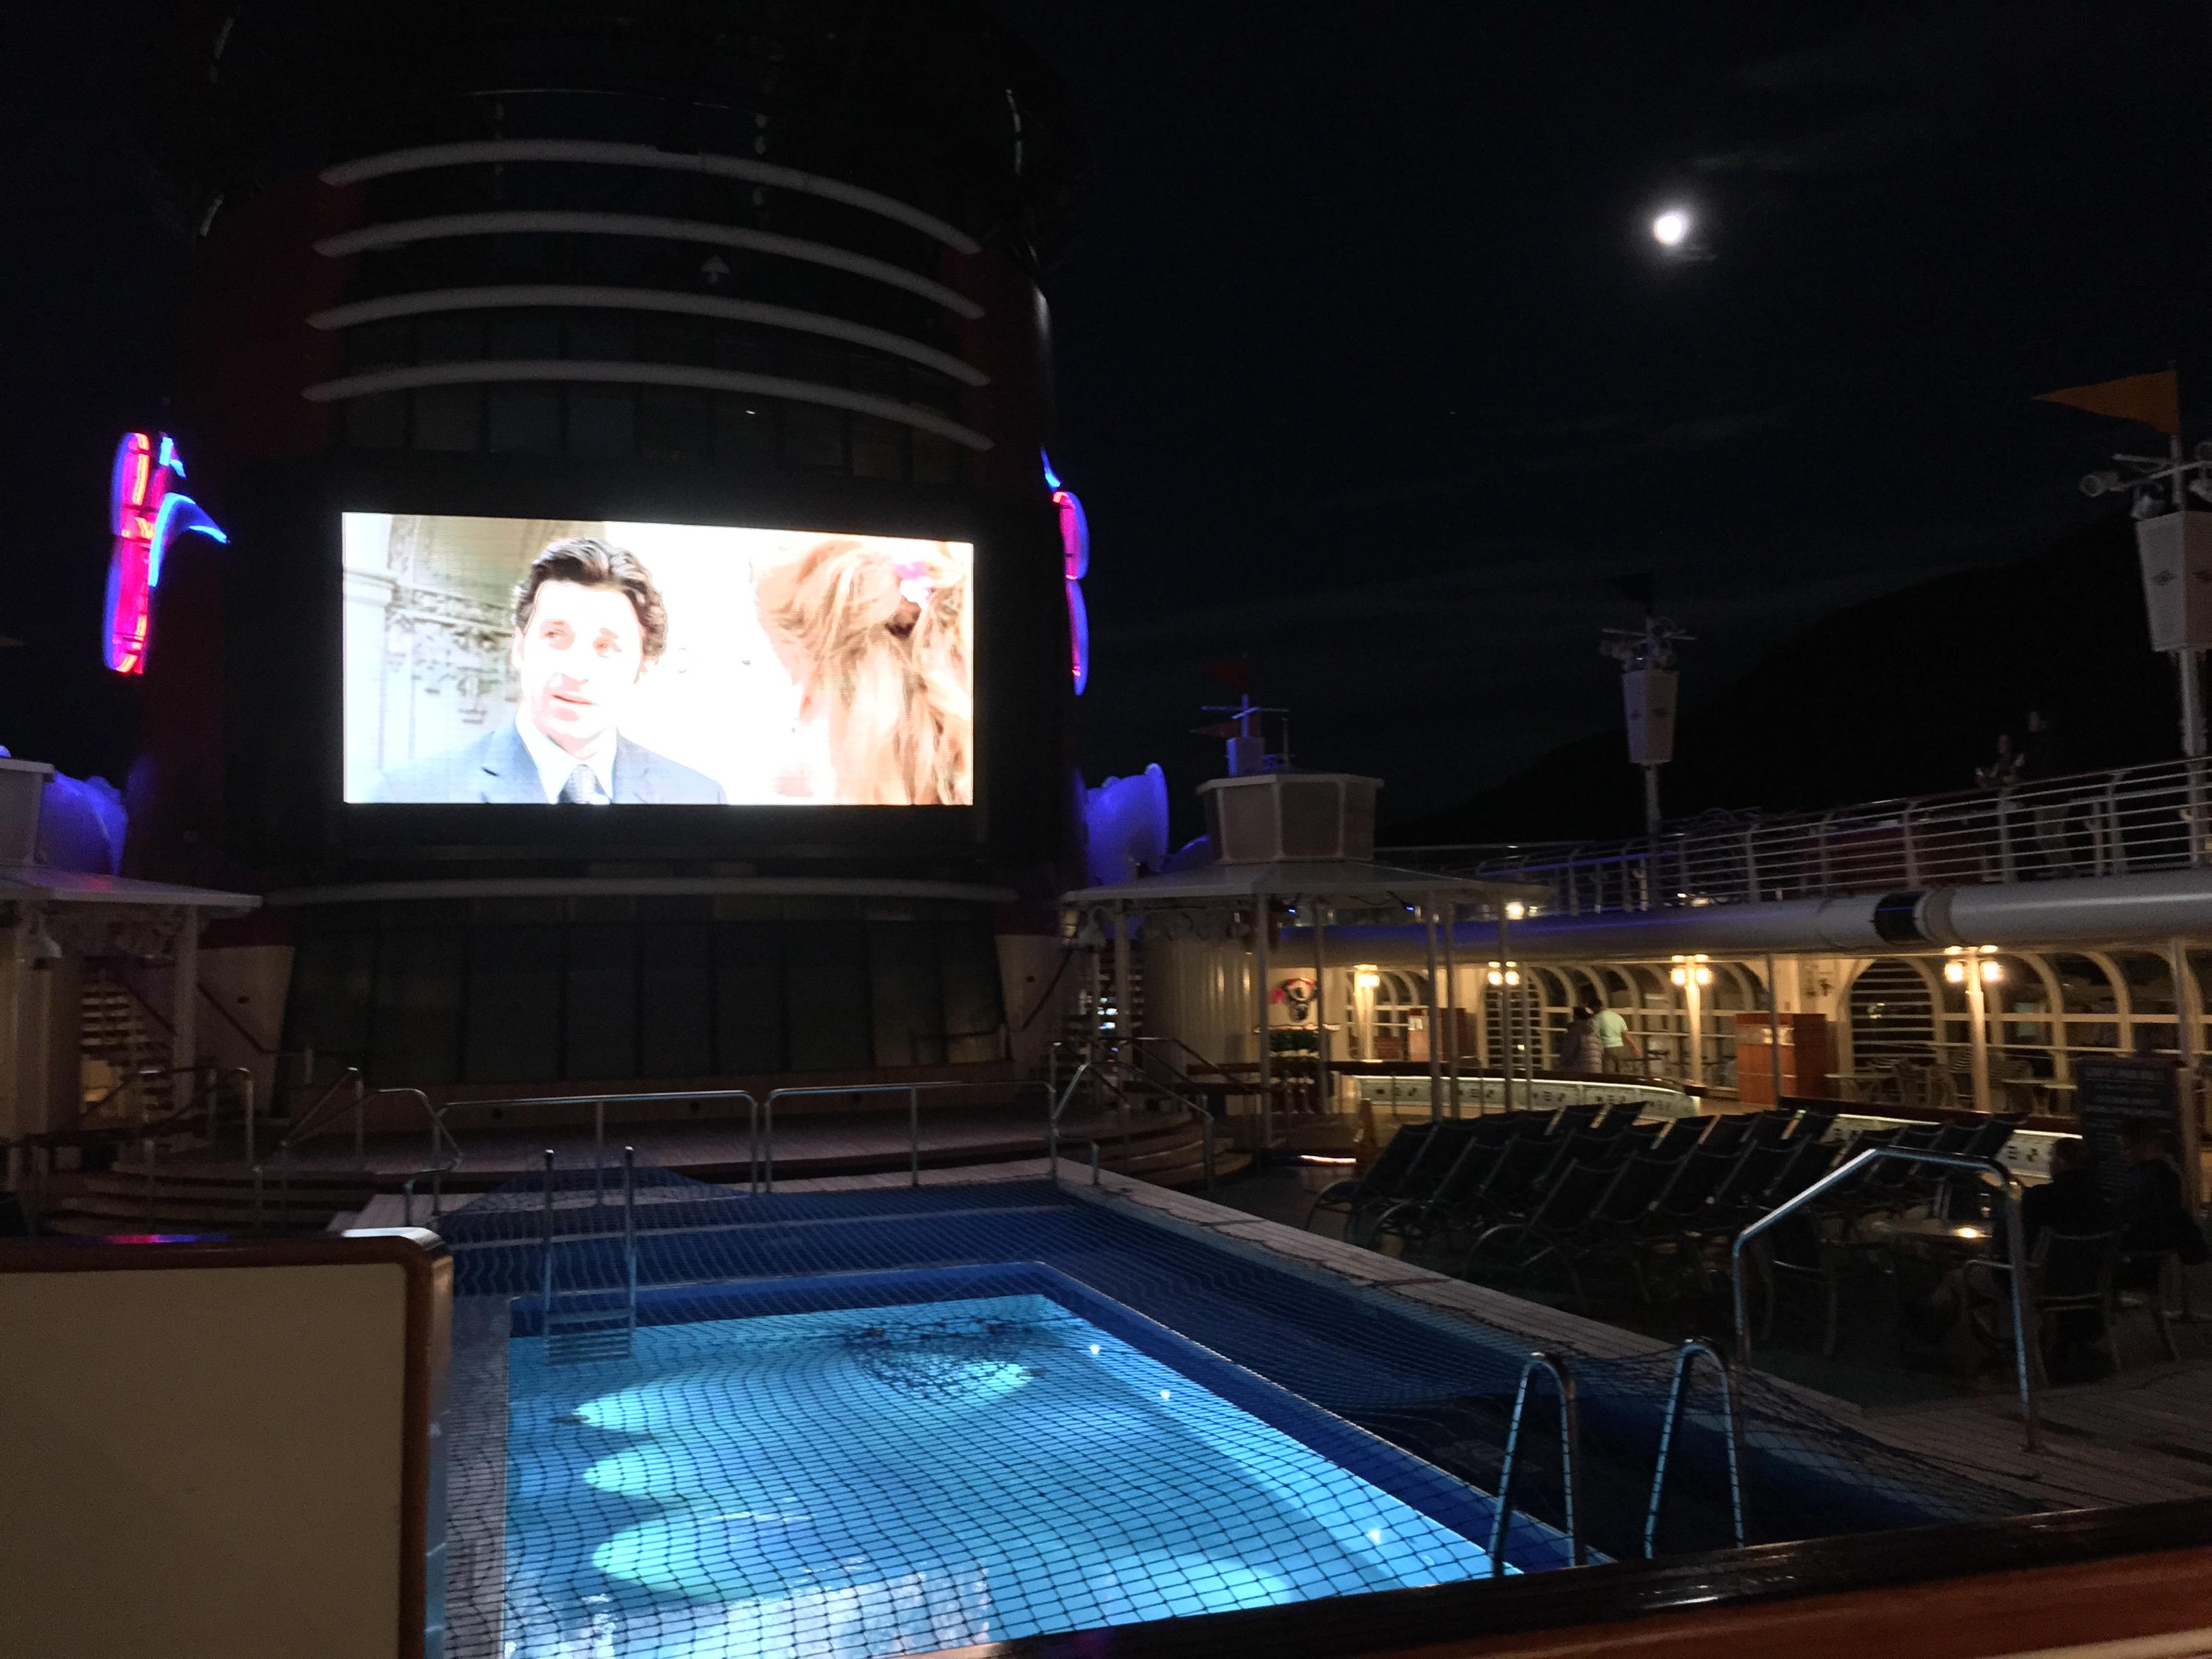 Whats Really On A Disney Cruise Disneyexaminer Nighttime